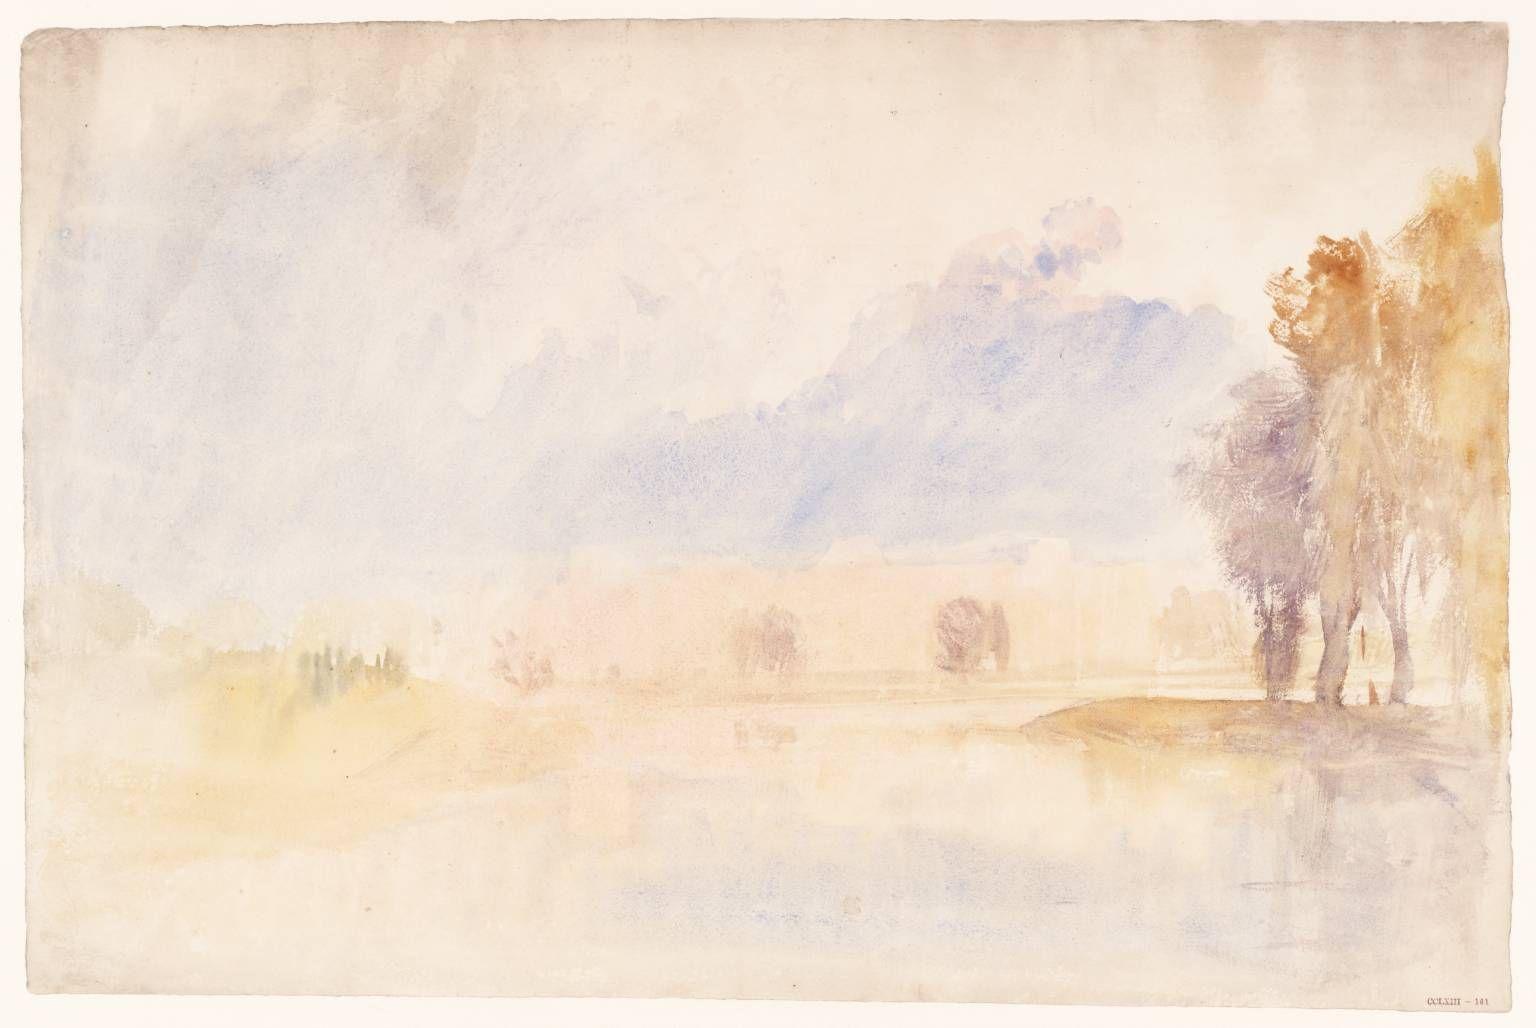 Bateau Turner Peinture De Venise Turner Peinture Et Art